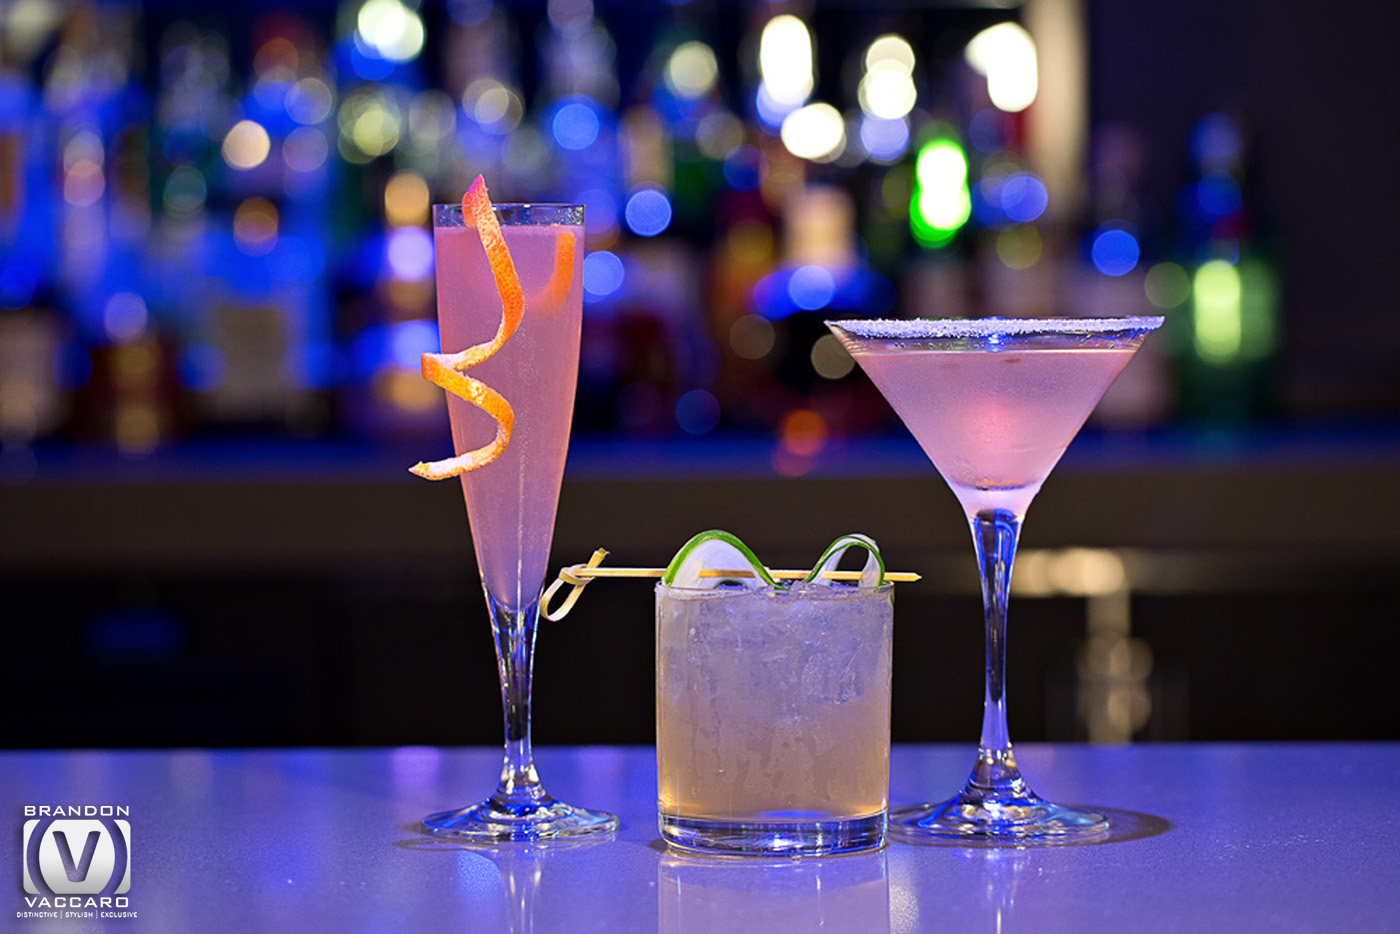 commercial-food-beverage-cocktails-photography.jpg